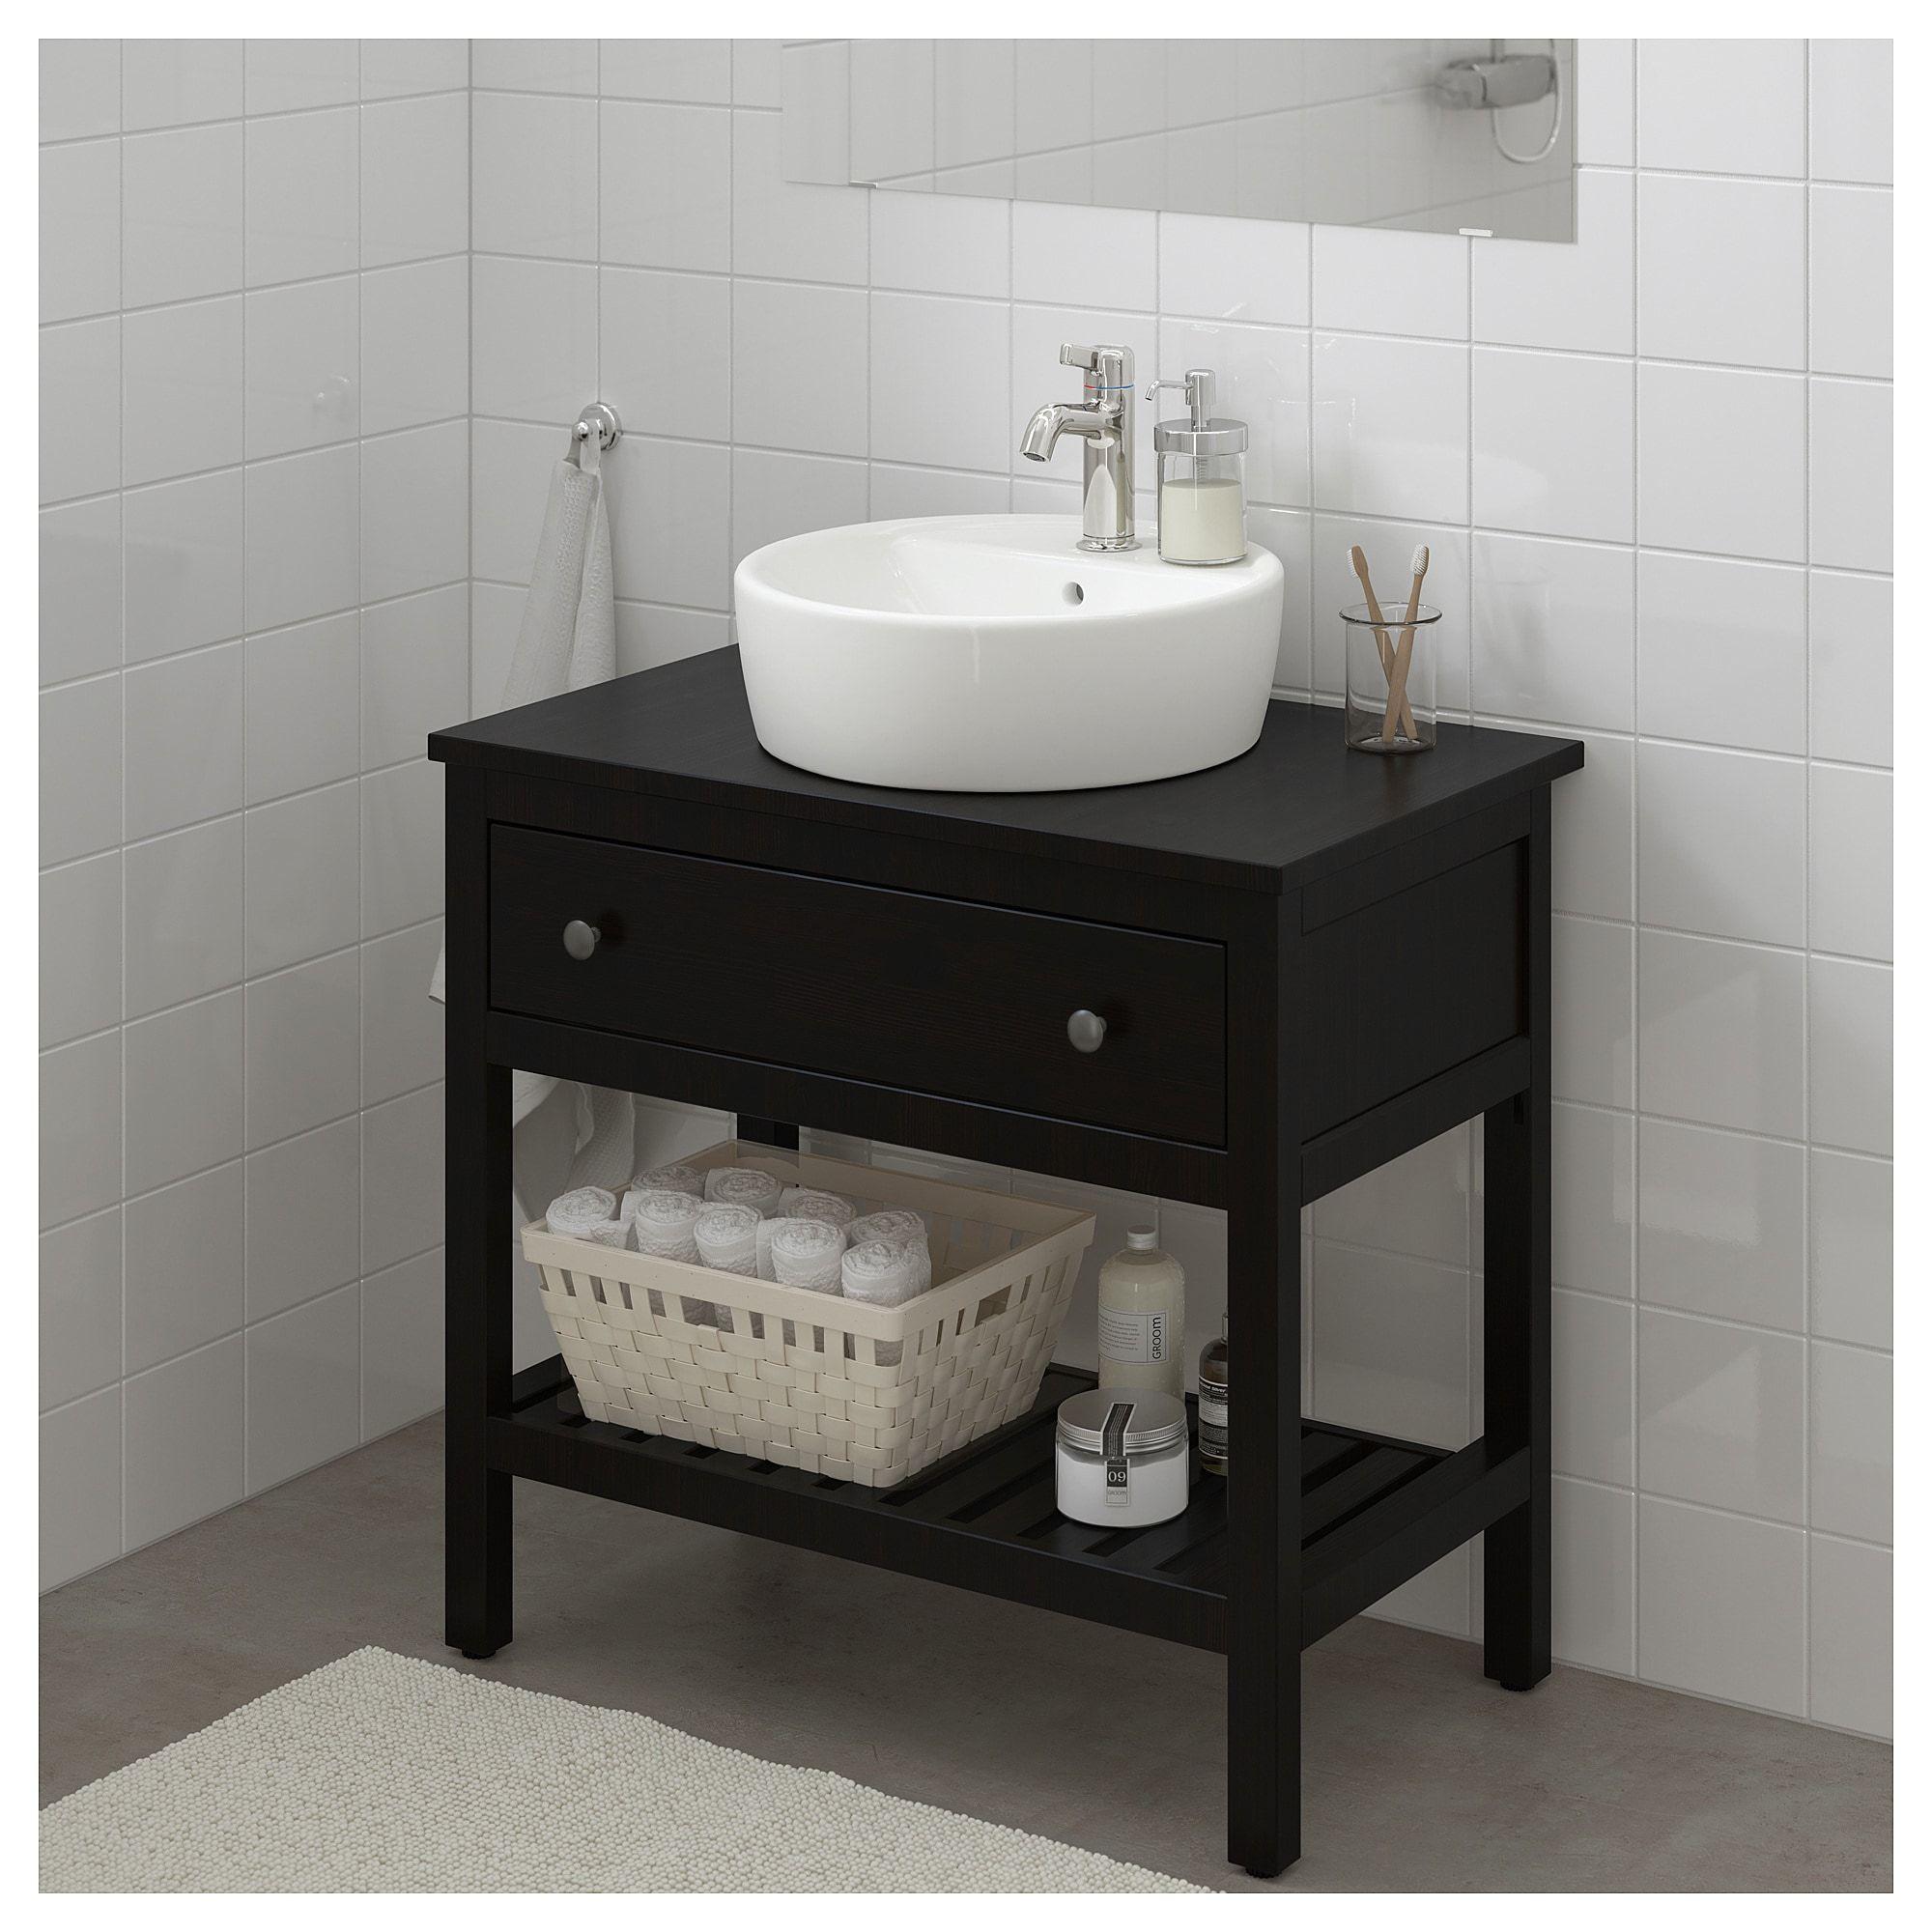 Etagere Pour Vasque A Poser ikea - hemnes bathroom vanity 1 drawer black-brown stain